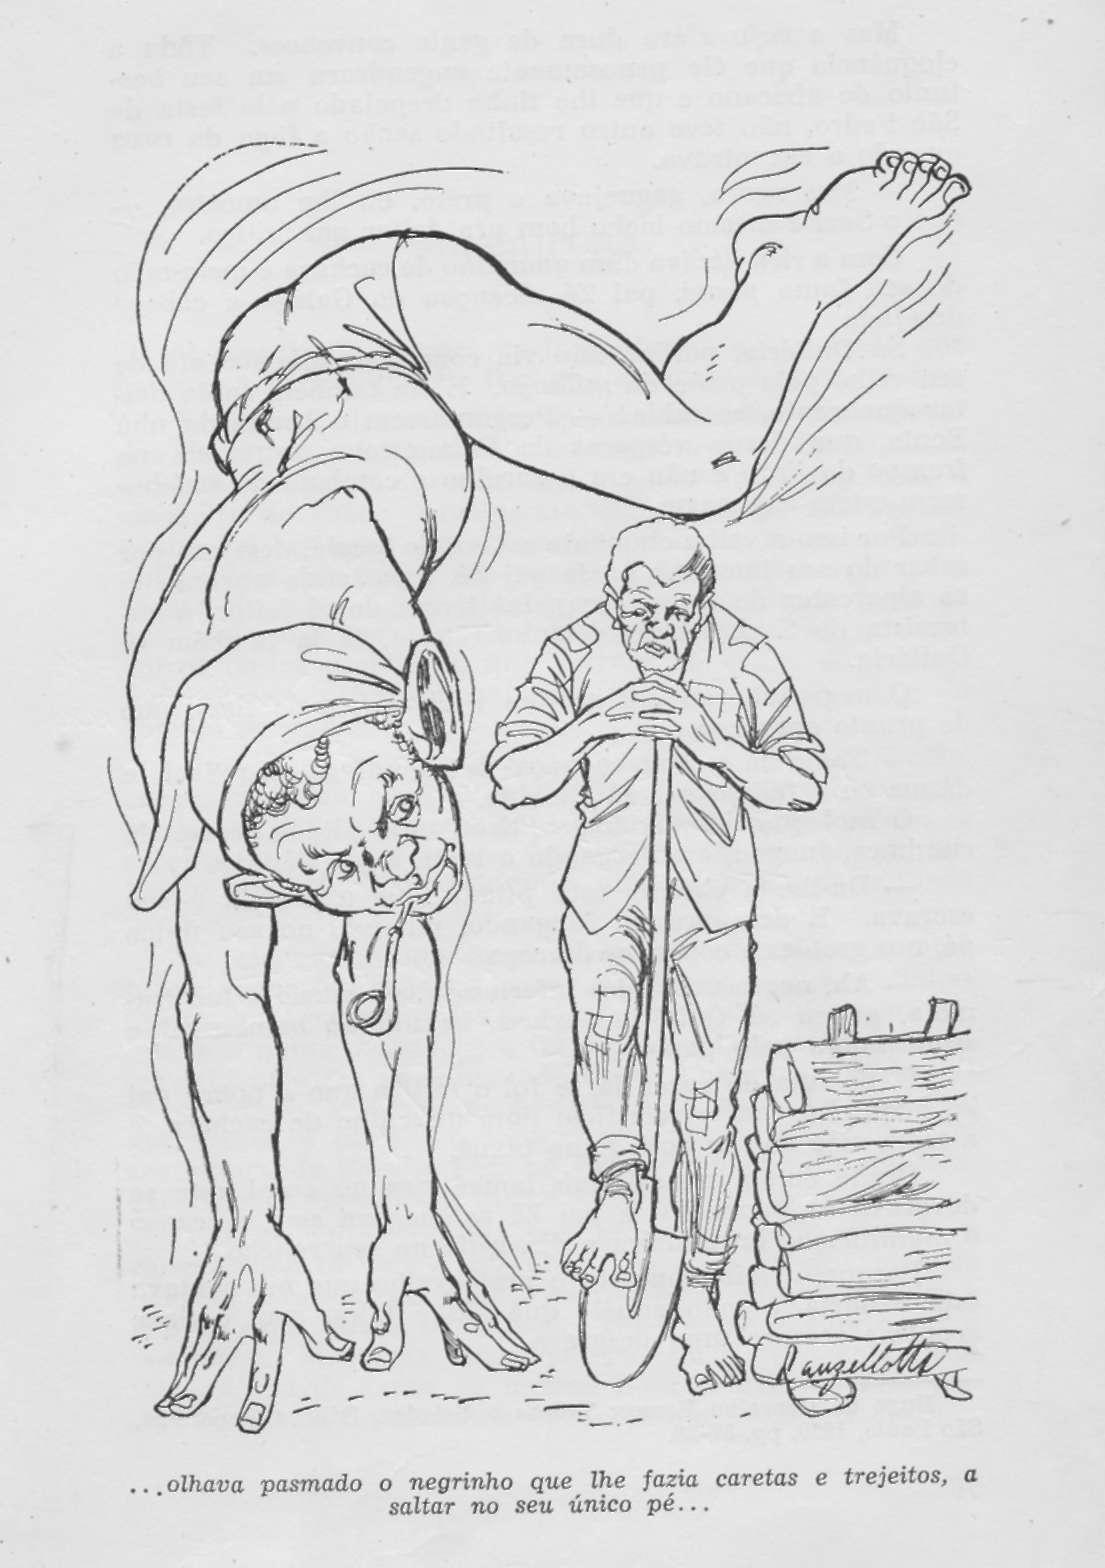 saci-pererê folclore goiano